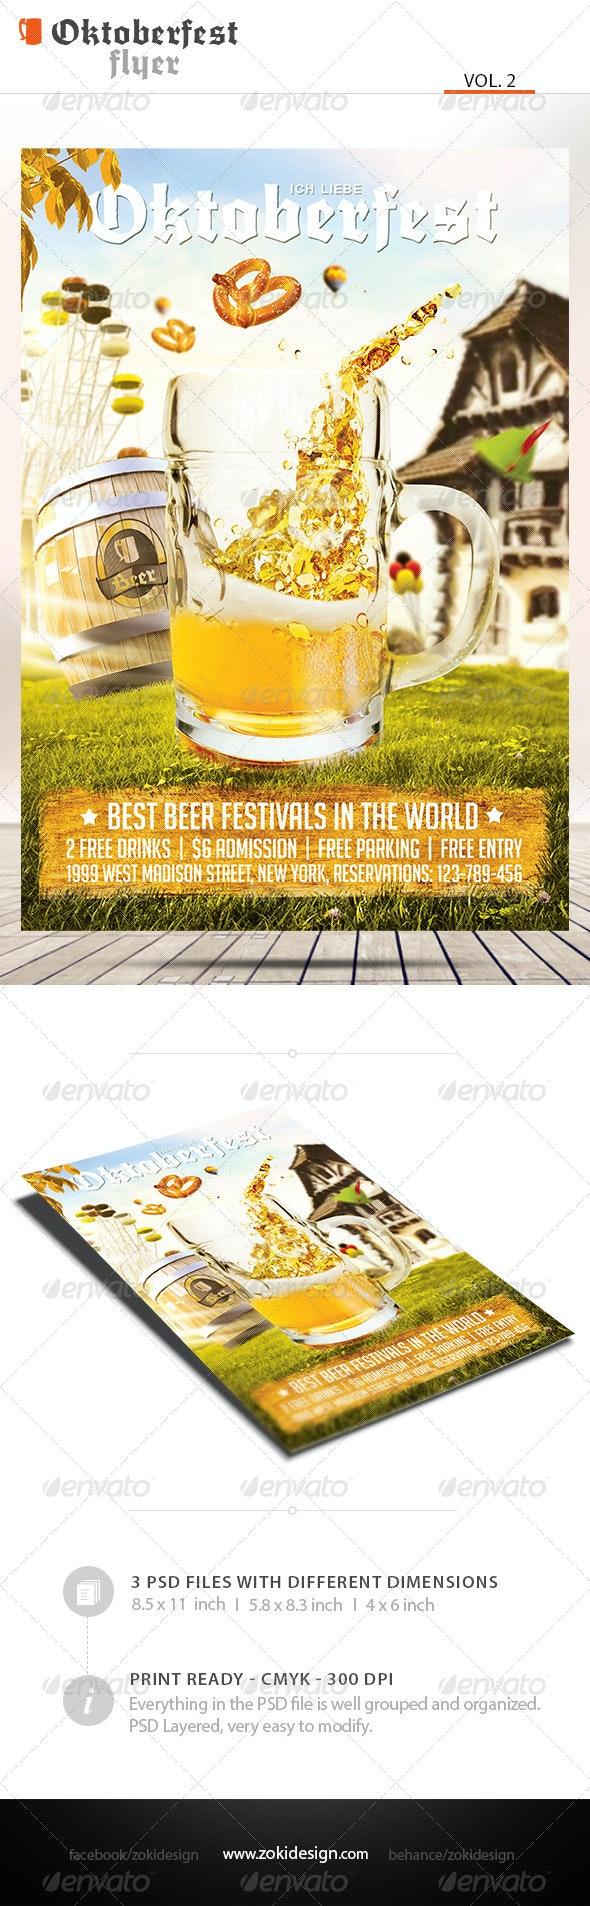 Oktoberfest Flyer Vol.2 - Clubs & Parties Events